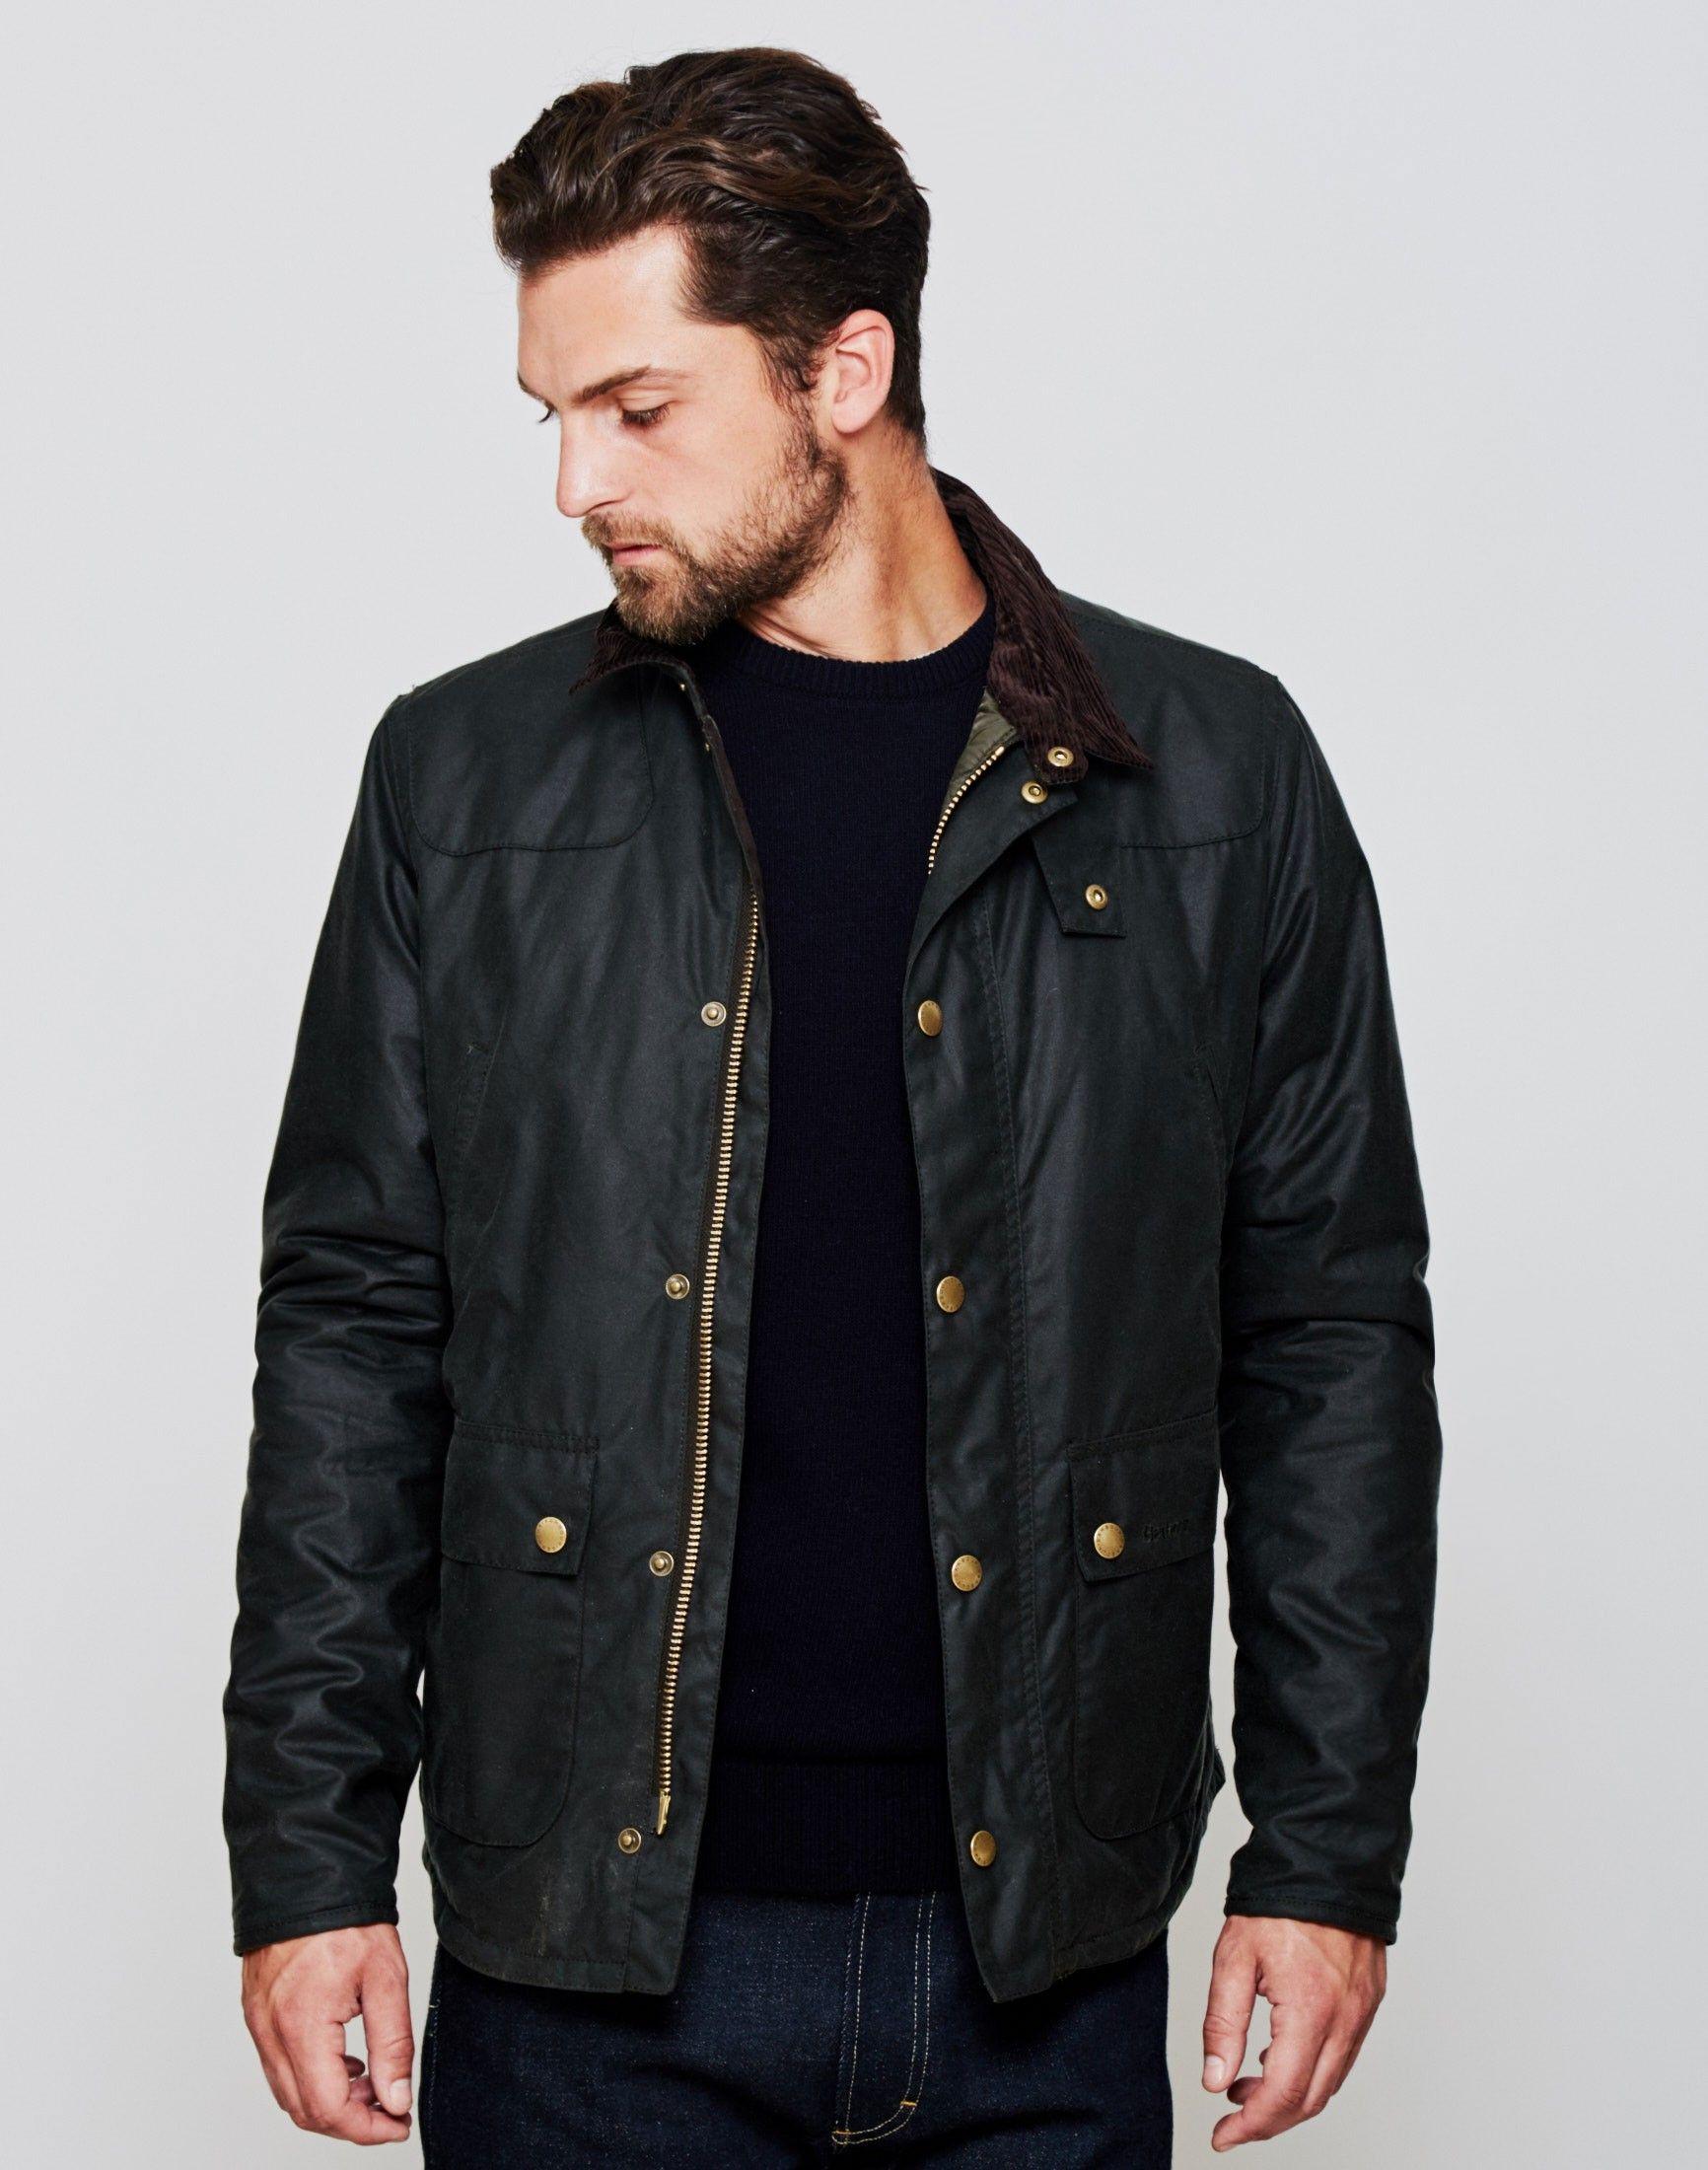 Barbour Jacket Homme